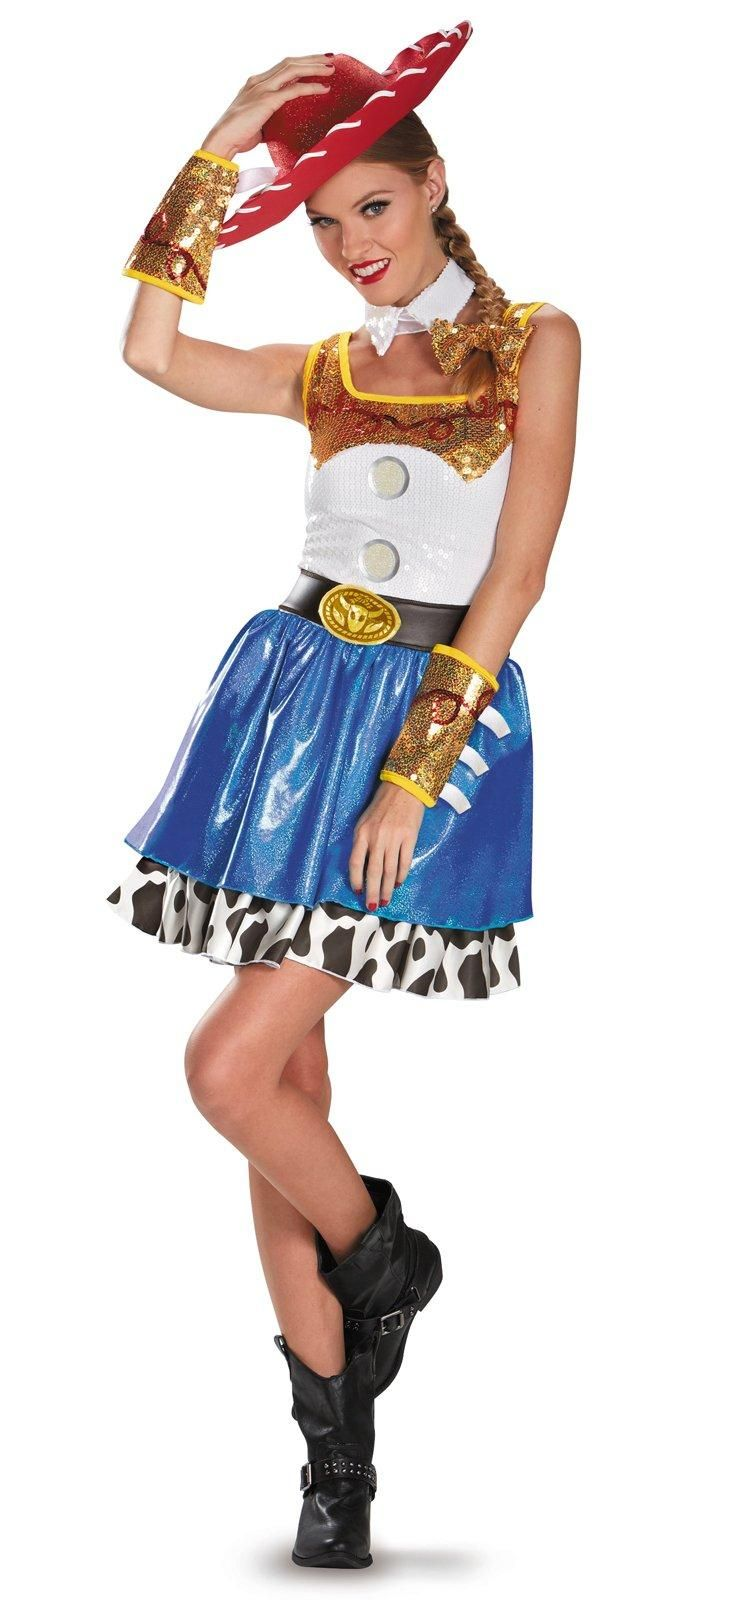 Disney Toy Story - Glam Jessie Costume from BuyCostumes.com  sc 1 st  Pinterest & Disney Toy Story - Glam Jessie Costume from BuyCostumes.com ...